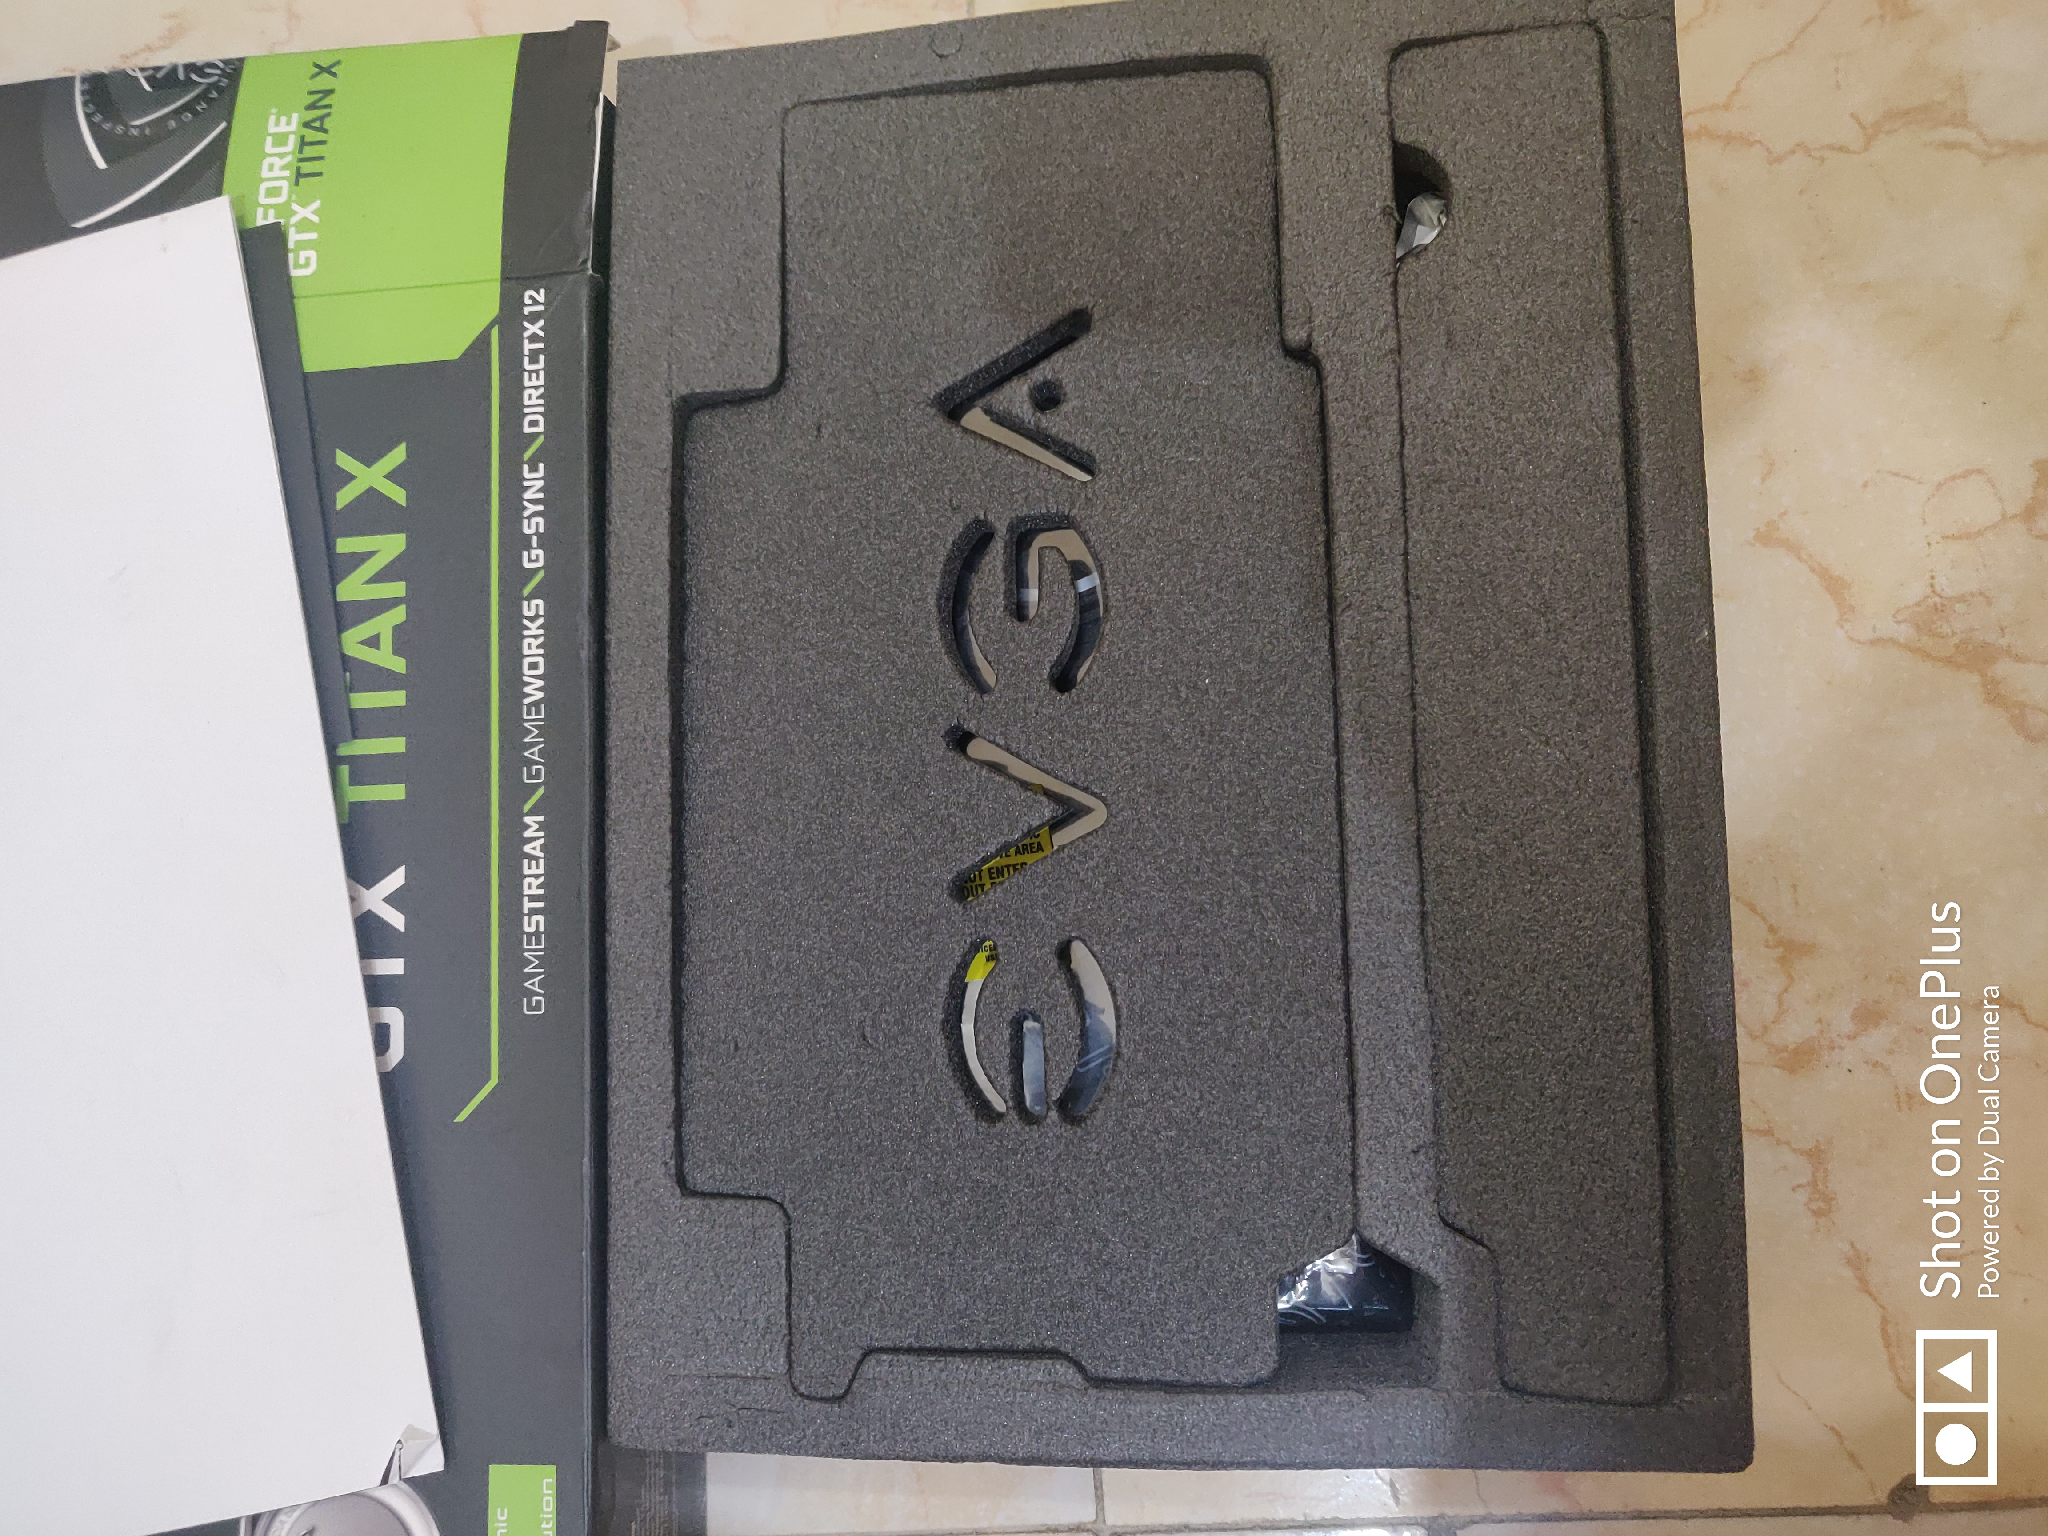 EVGA TITAN X 12GB rush offer now